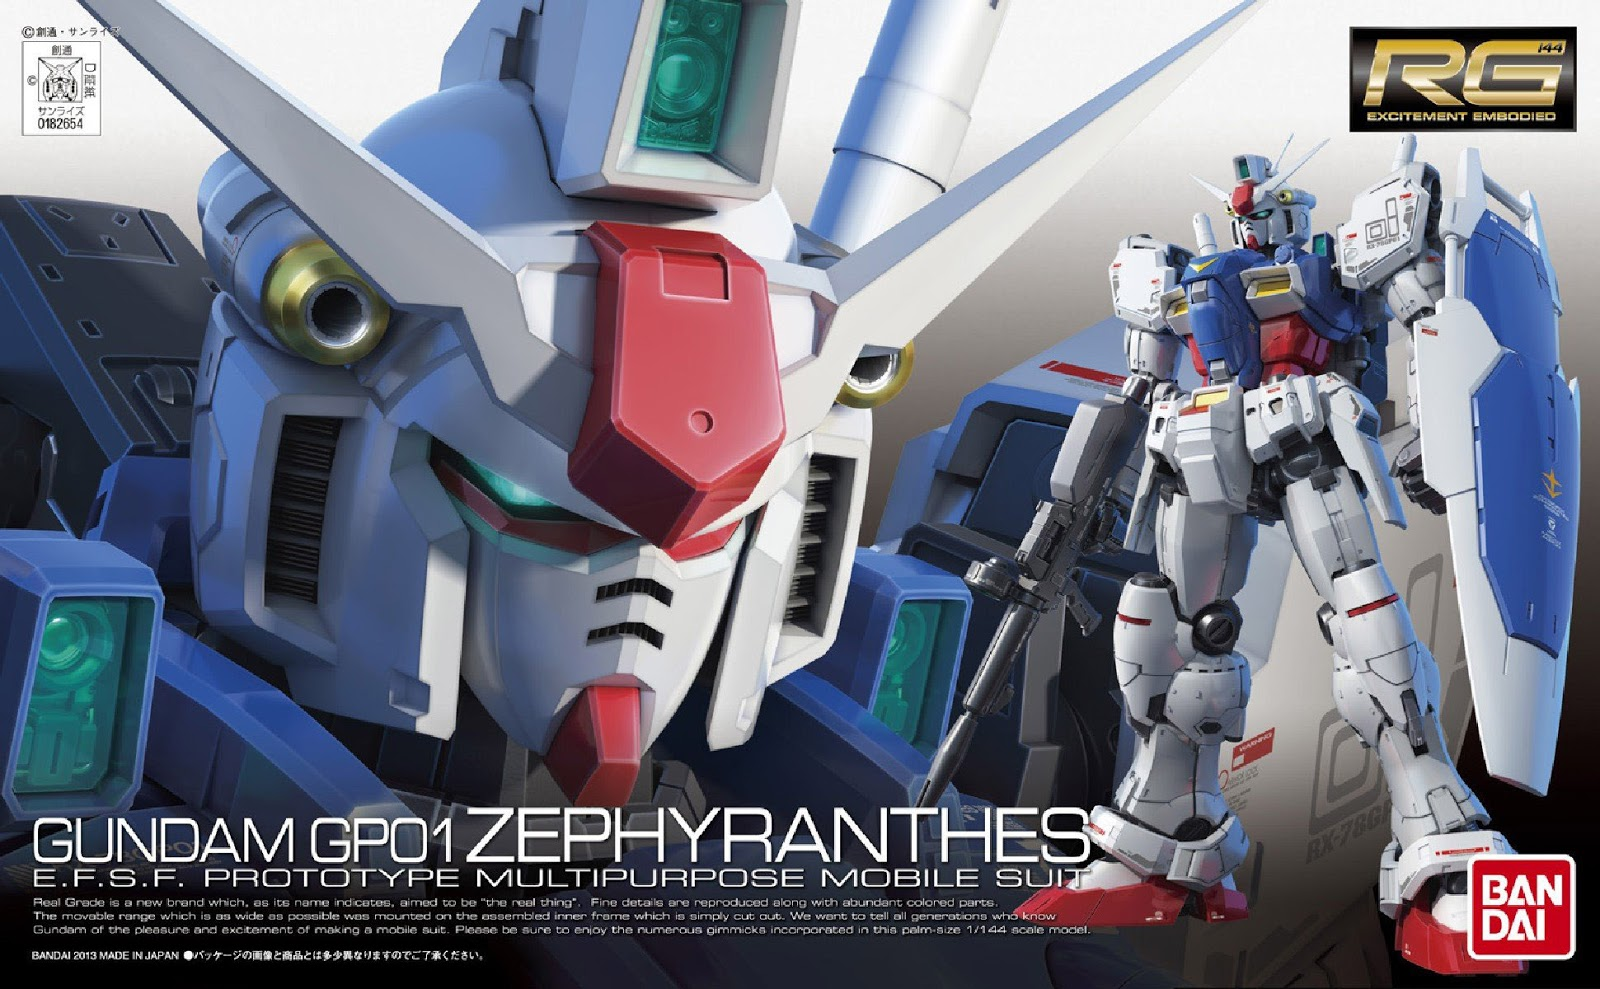 RG GP01 Zephyranthes